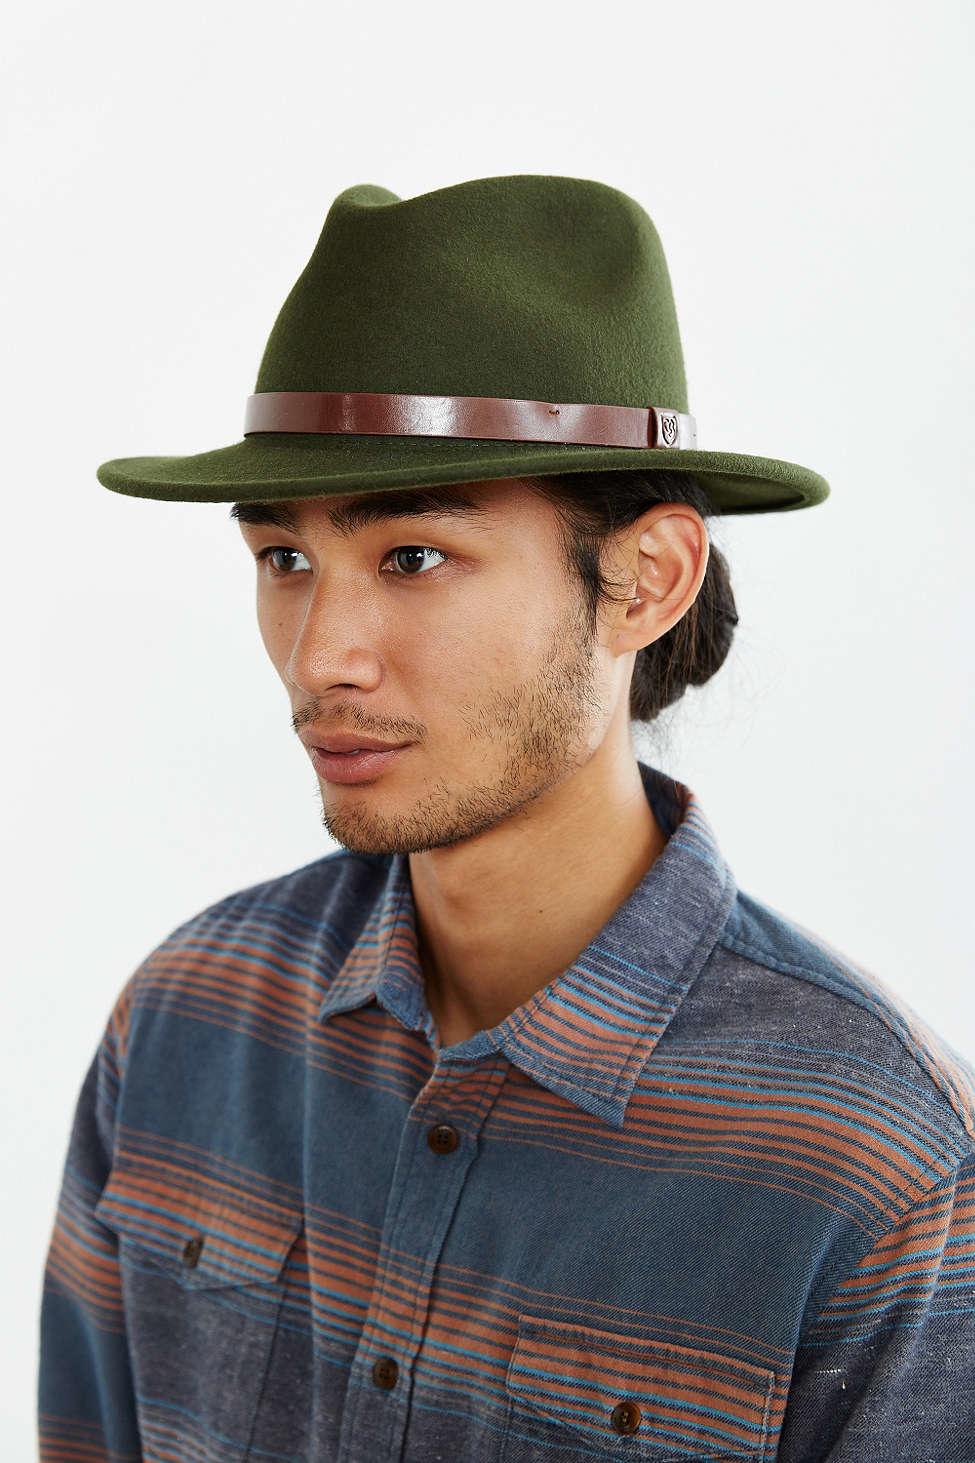 b3ea4db0fa7db Brixton Messer Fedora Hat in Green for Men - Lyst